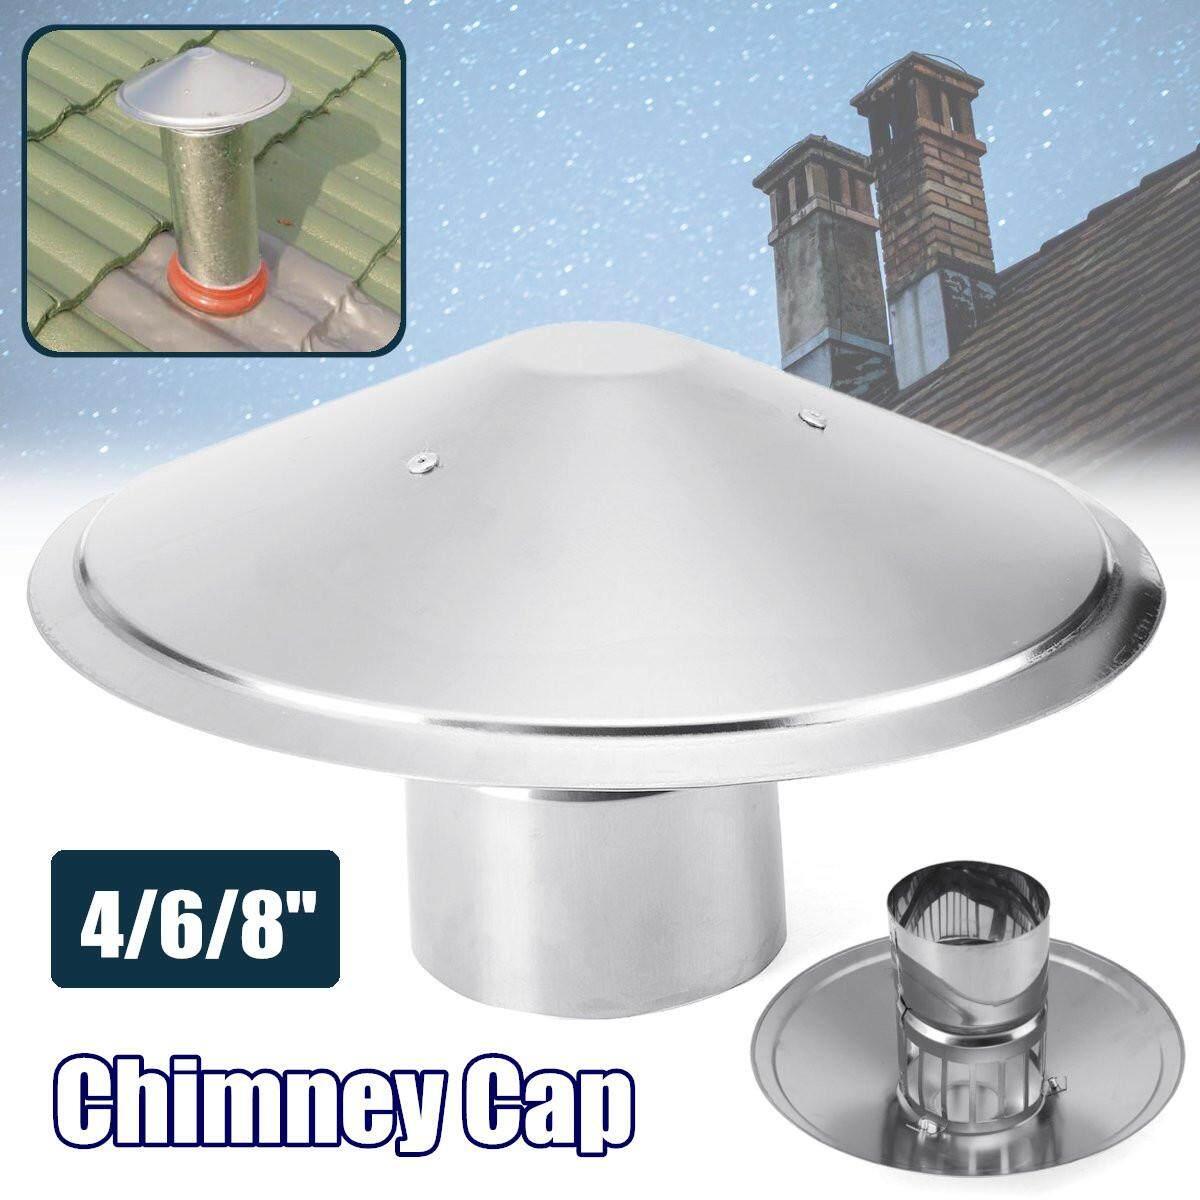 4inch Stove Pipe Chimney Cap Galvanized Iron Mushroom Shaped Roof Ventilation